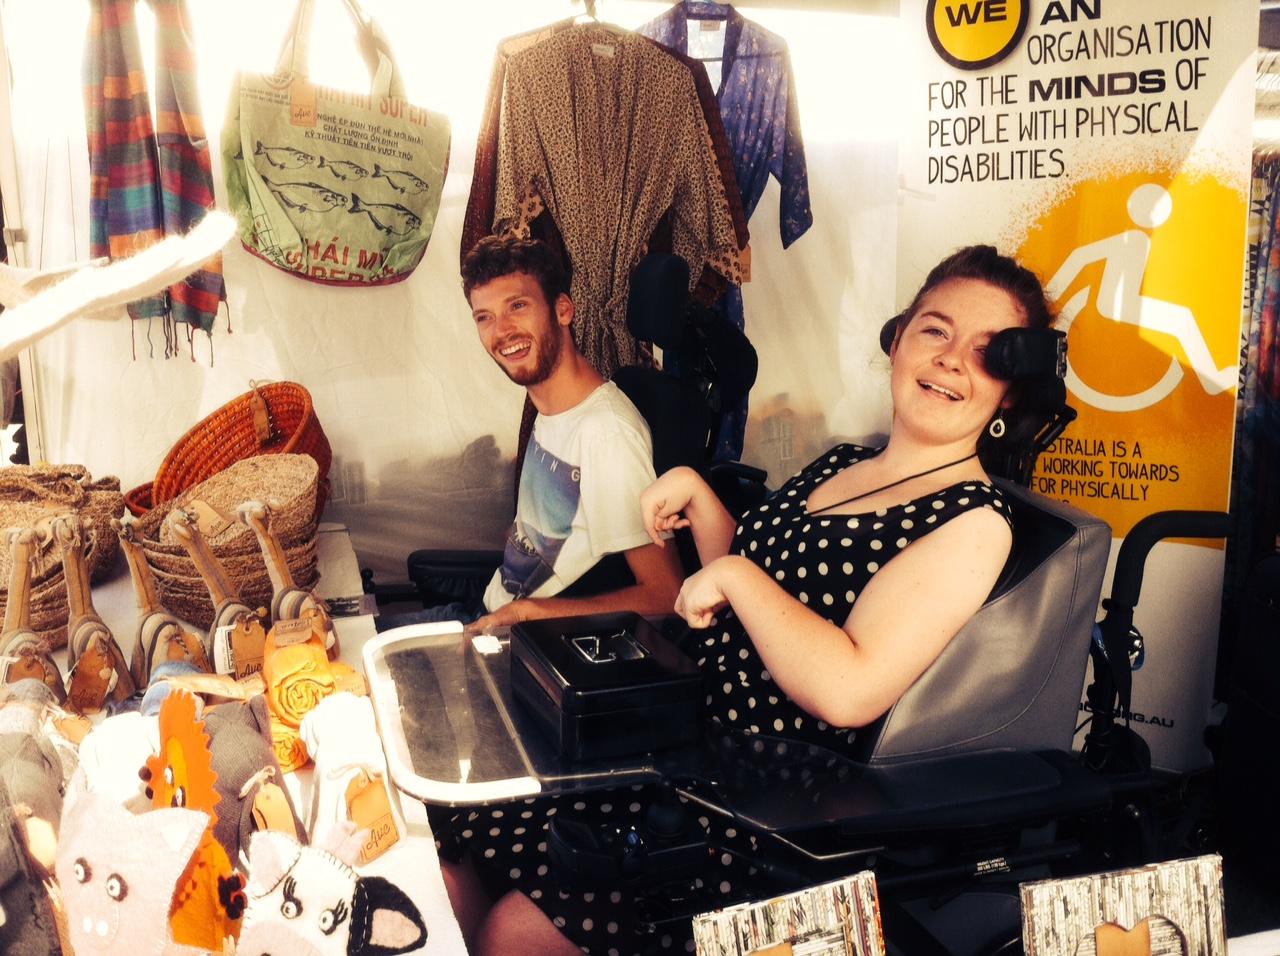 Nick and Georgia working hard at the Avenue Fair Trade stall, Kirribilli Markets, Sydney